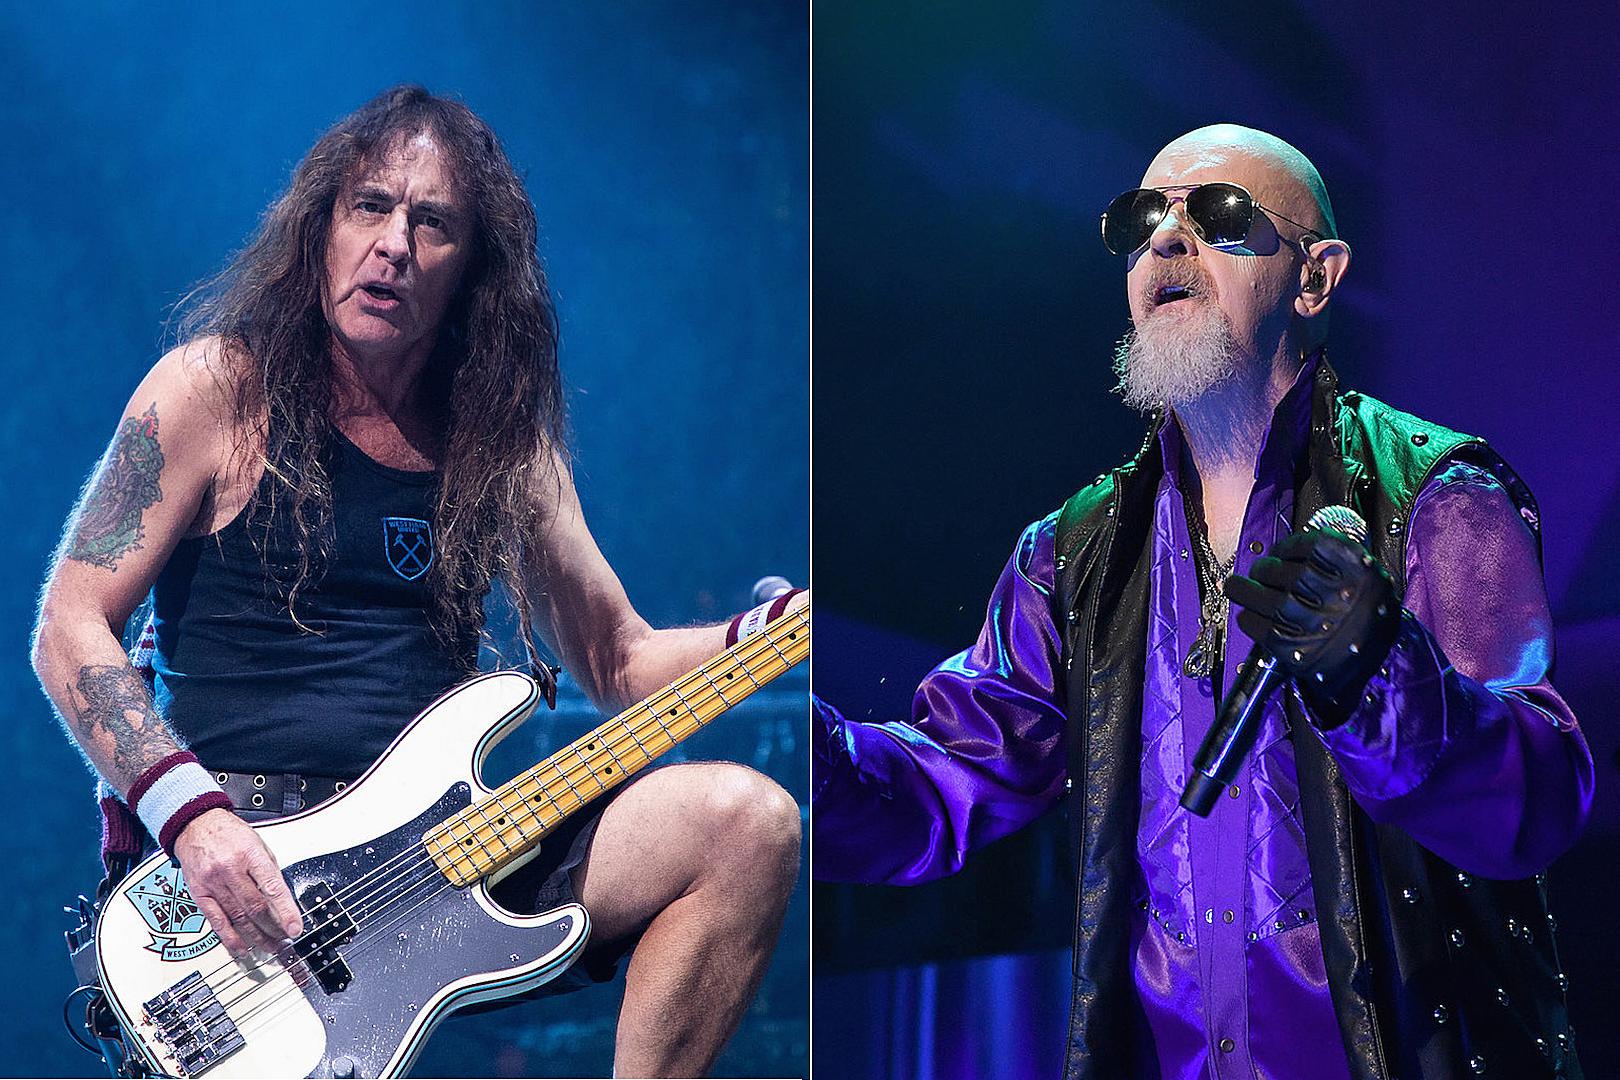 Steve Harris on Idea of Iron Maiden + Judas Priest Tour: 'Why Not?'